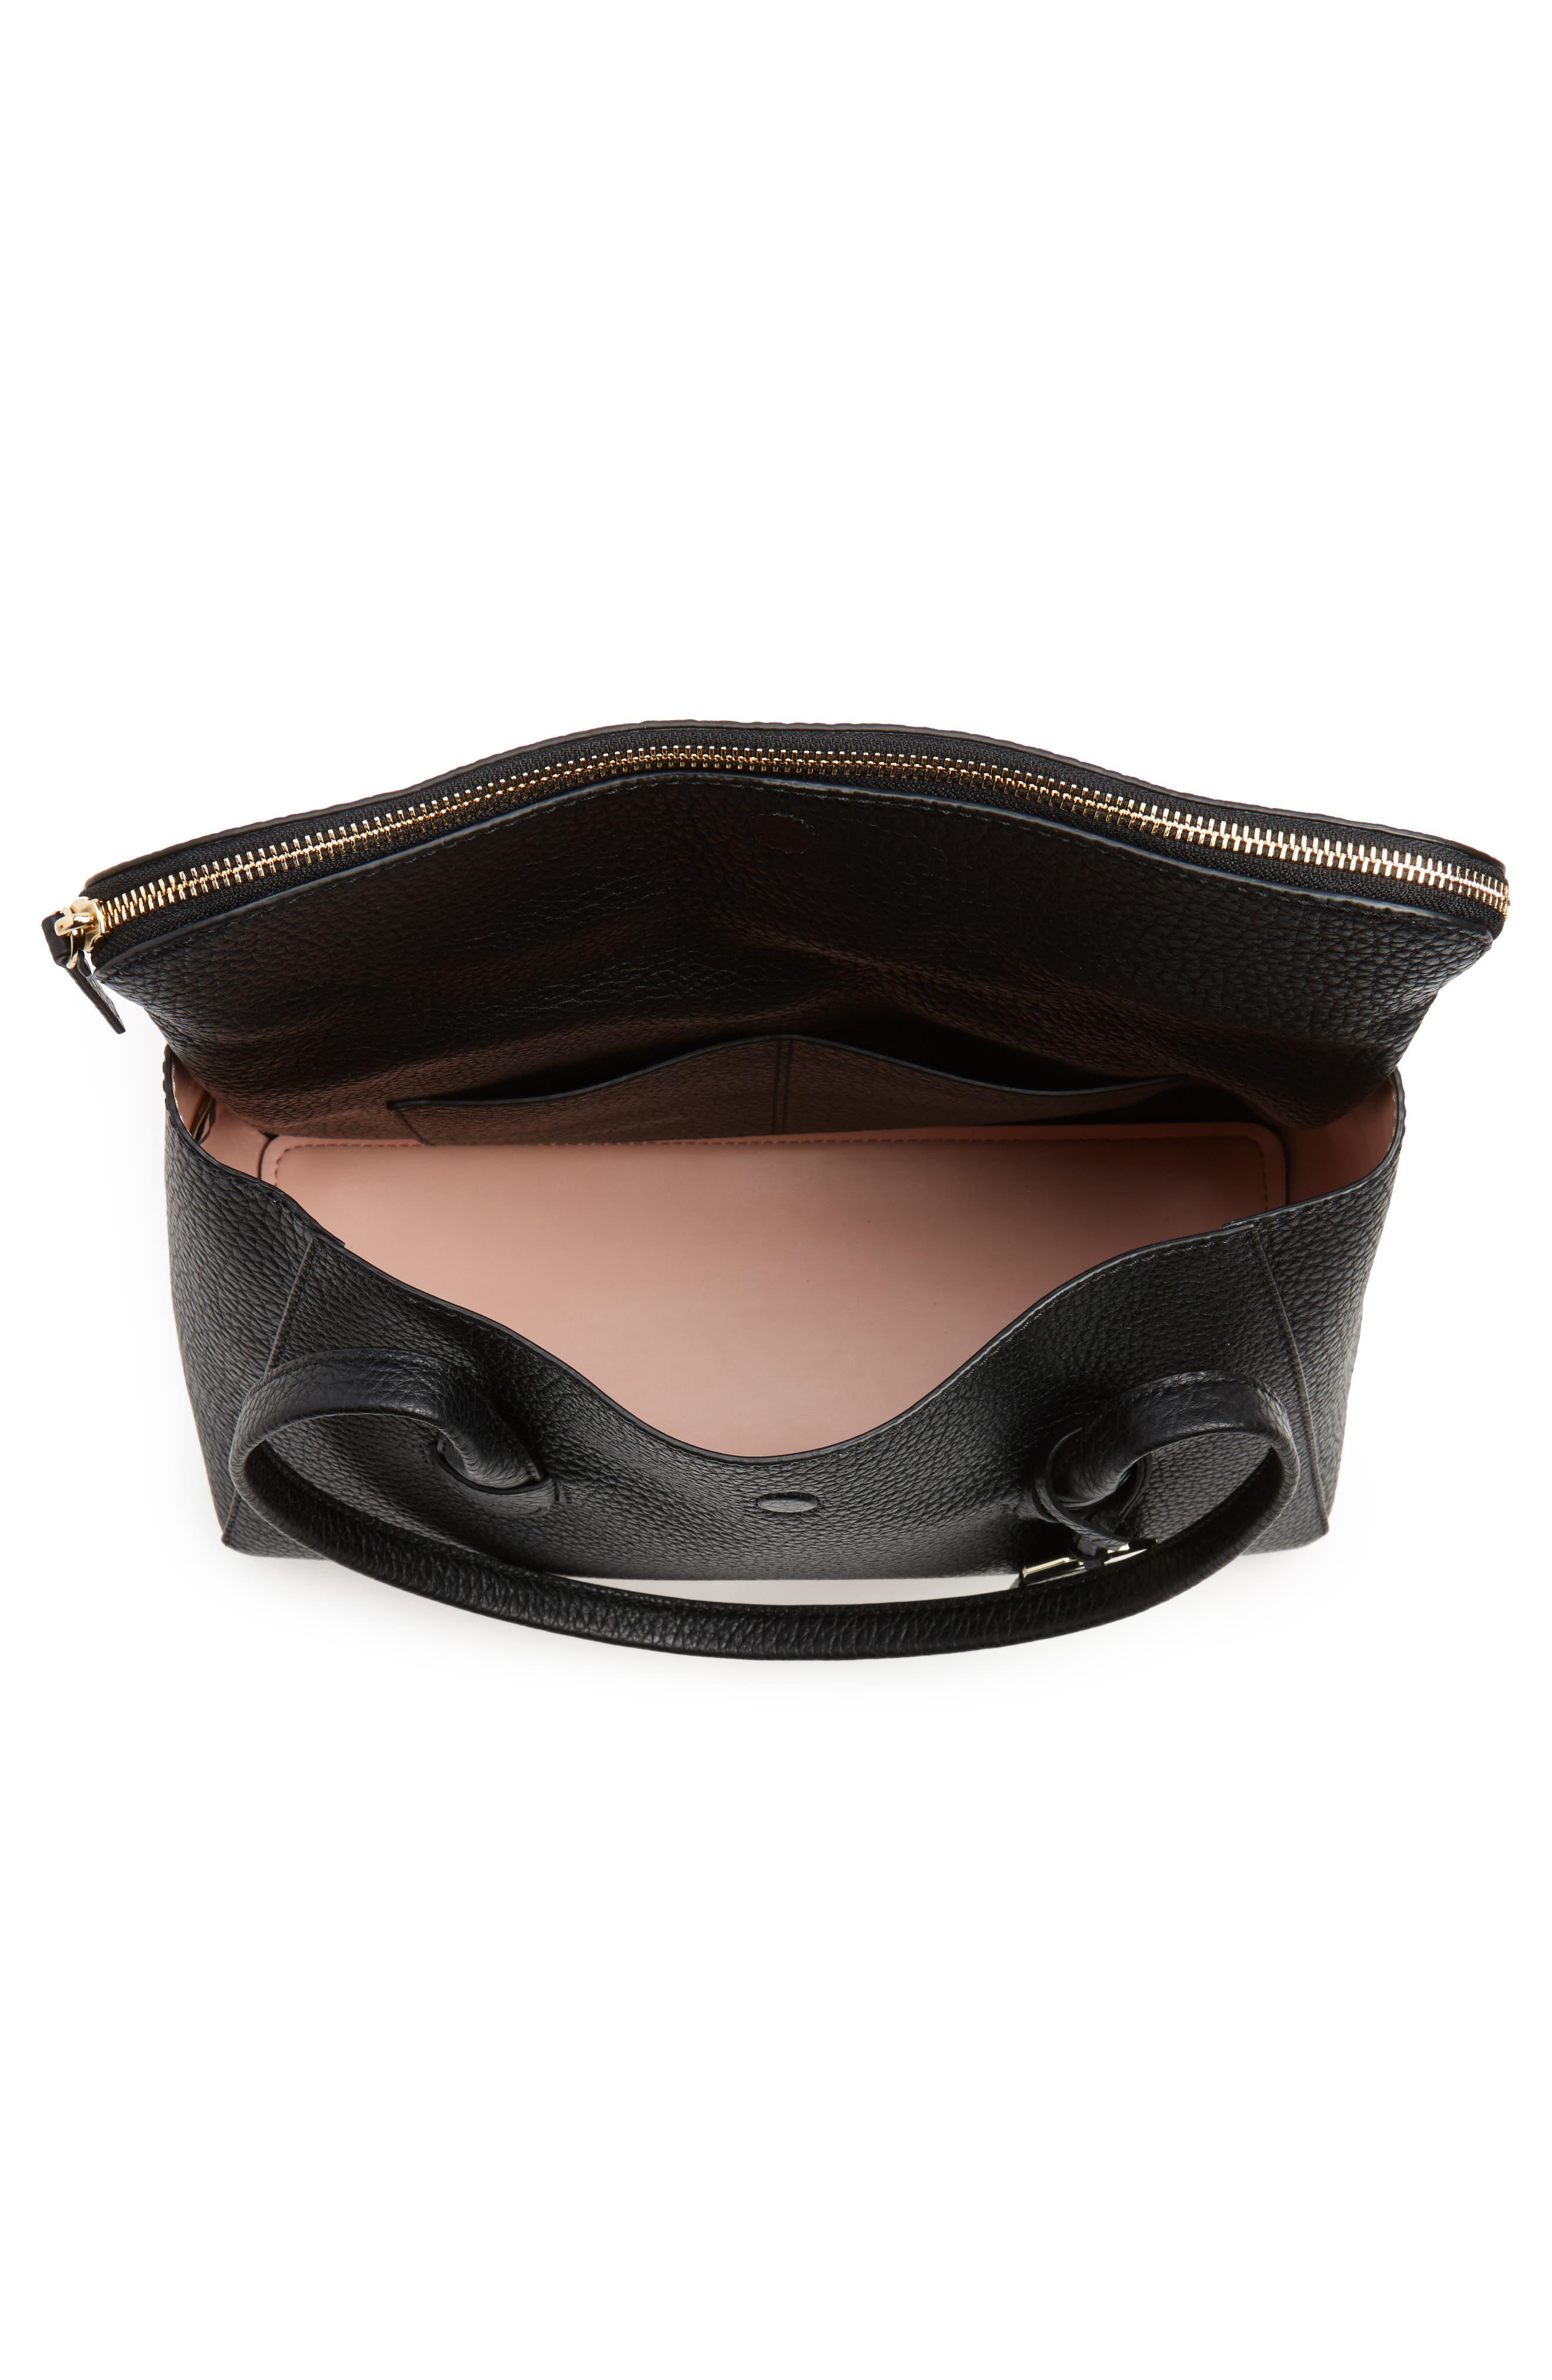 carter street - laurelle leather tote,                             Alternate thumbnail 4, color,                             001